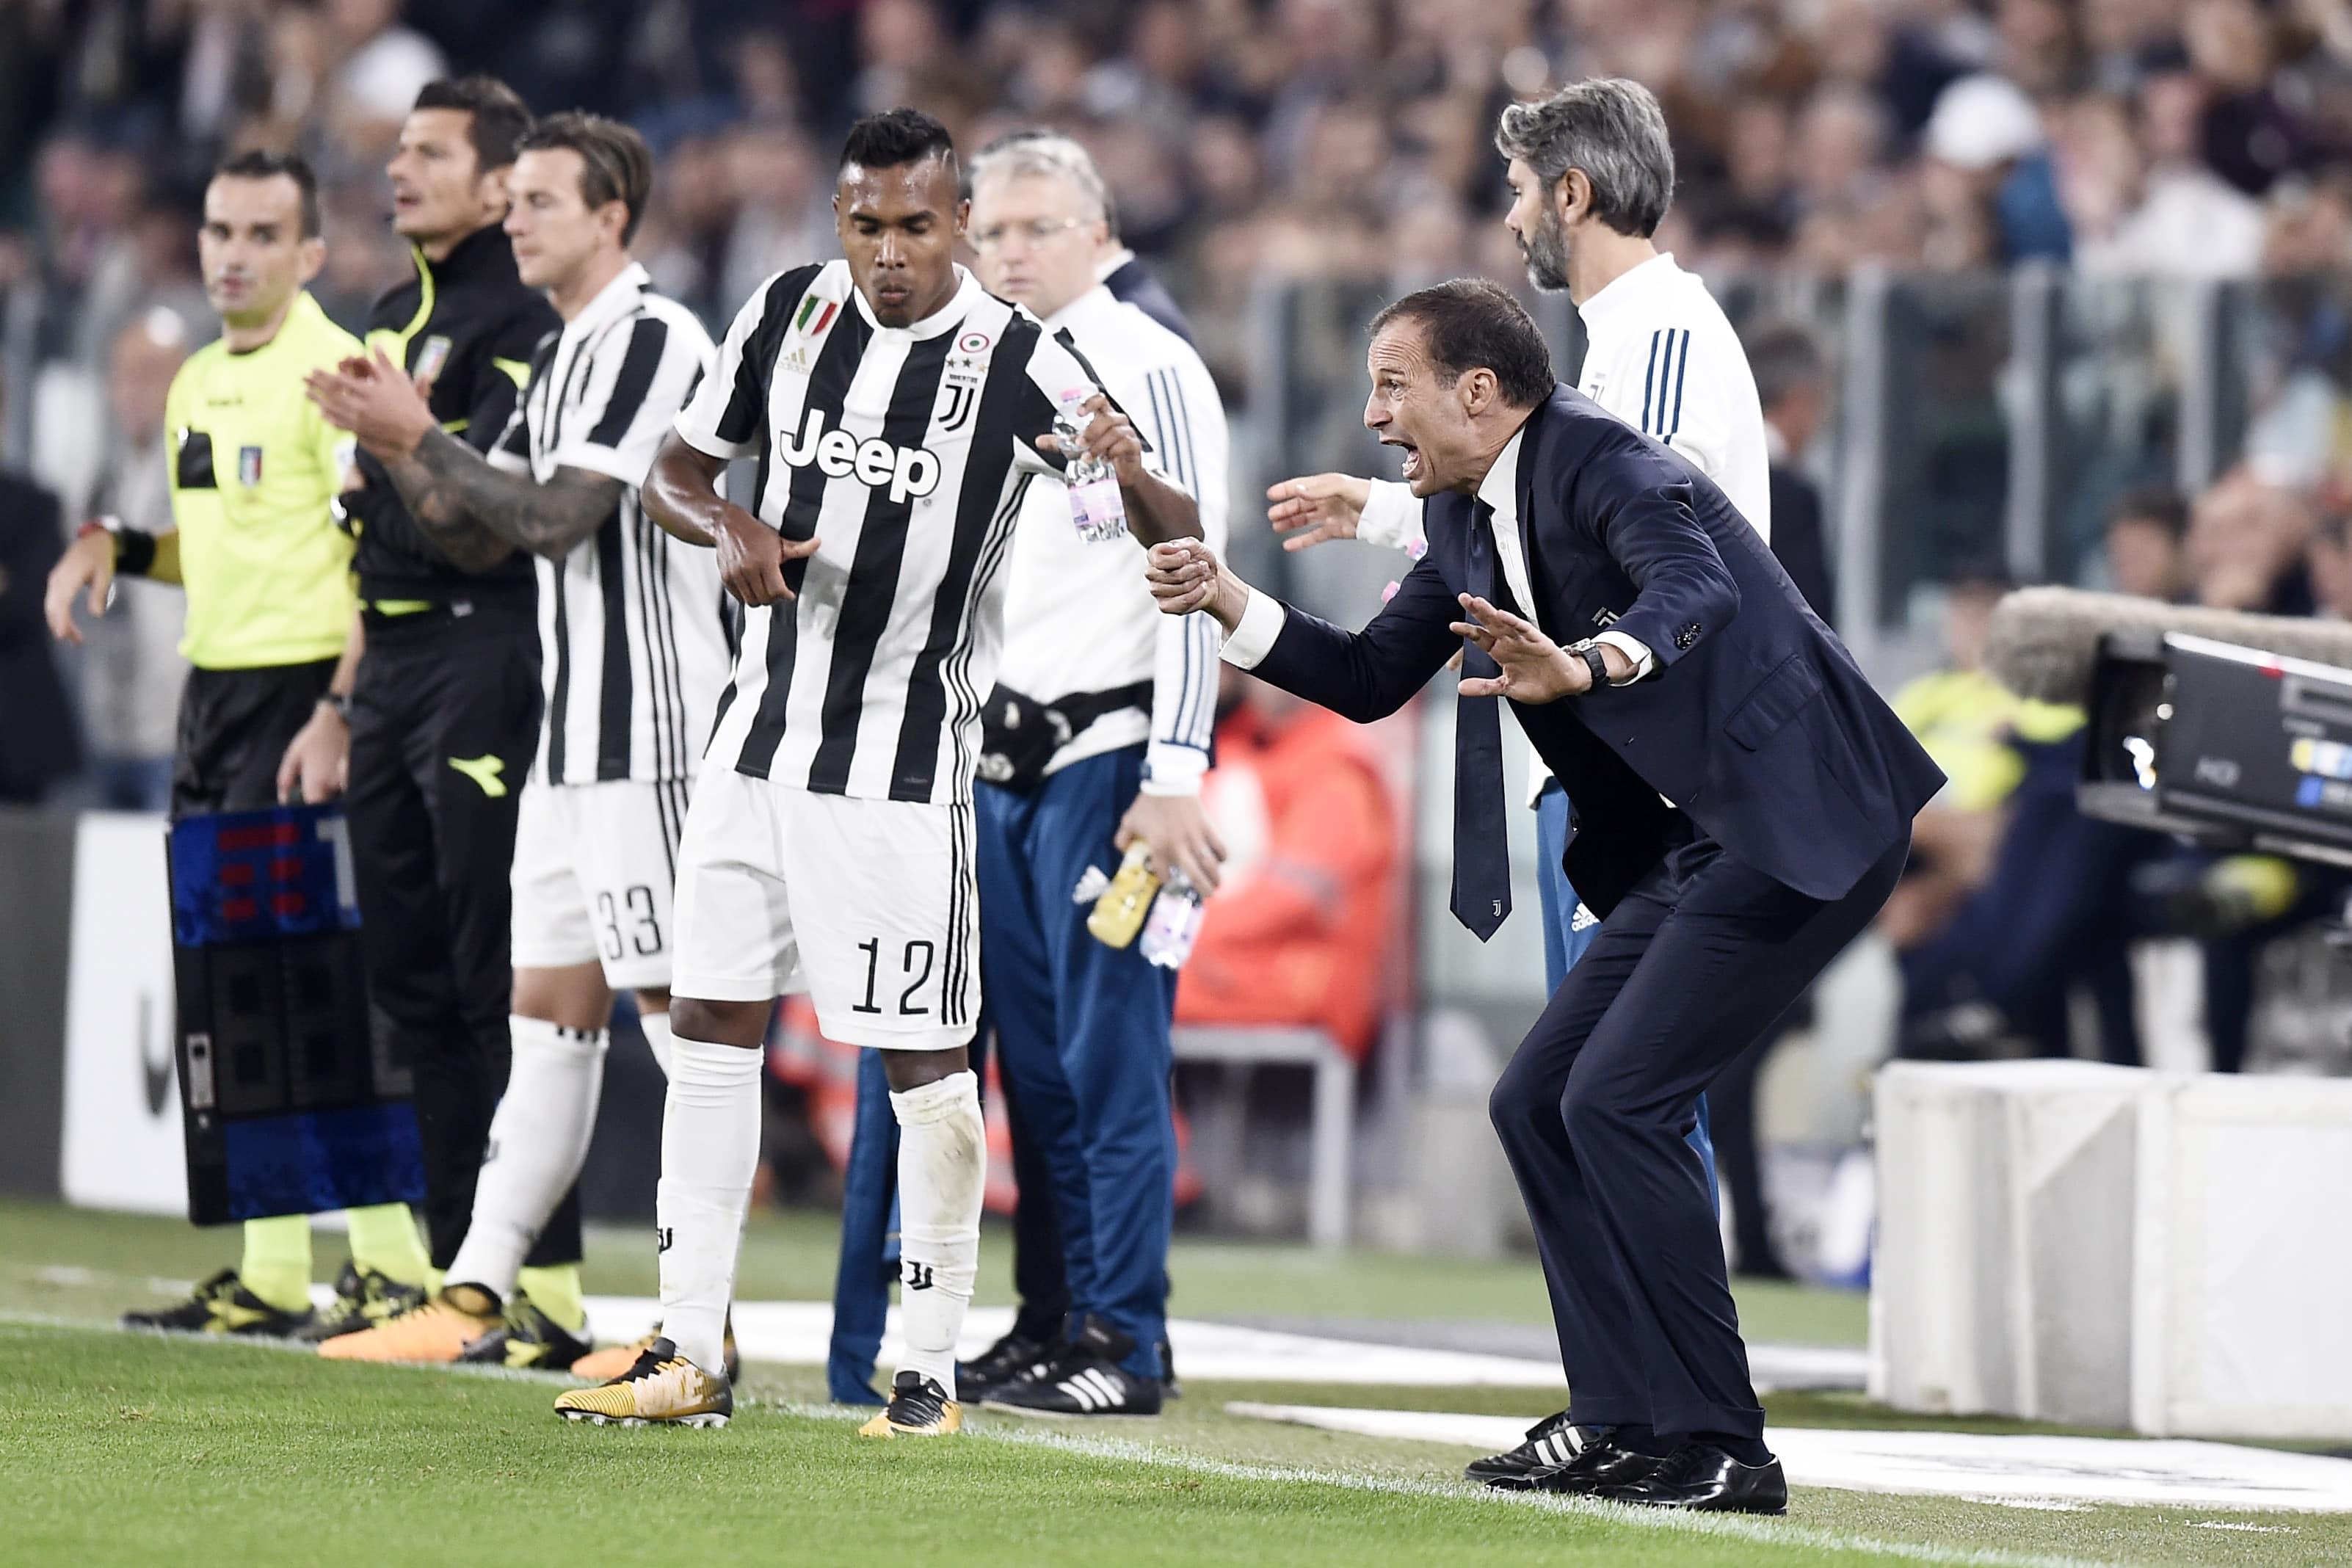 Dove Vedere In Streaming Juventus Milan Diretta